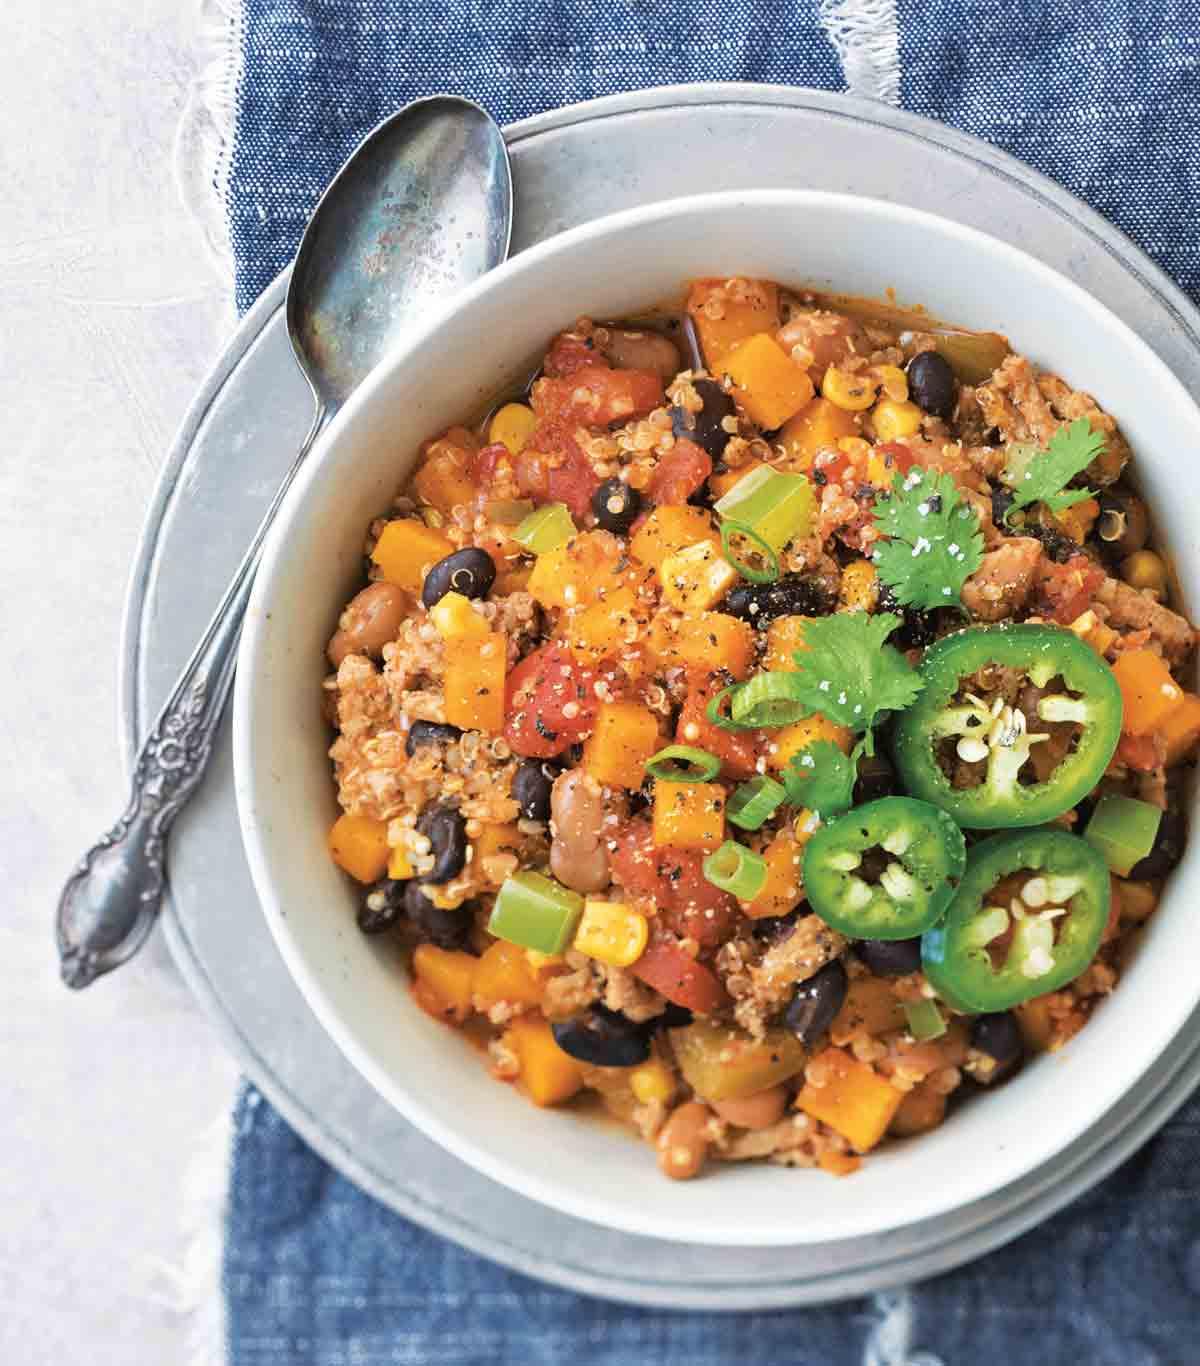 Chili recipe from Jessica's cookbook